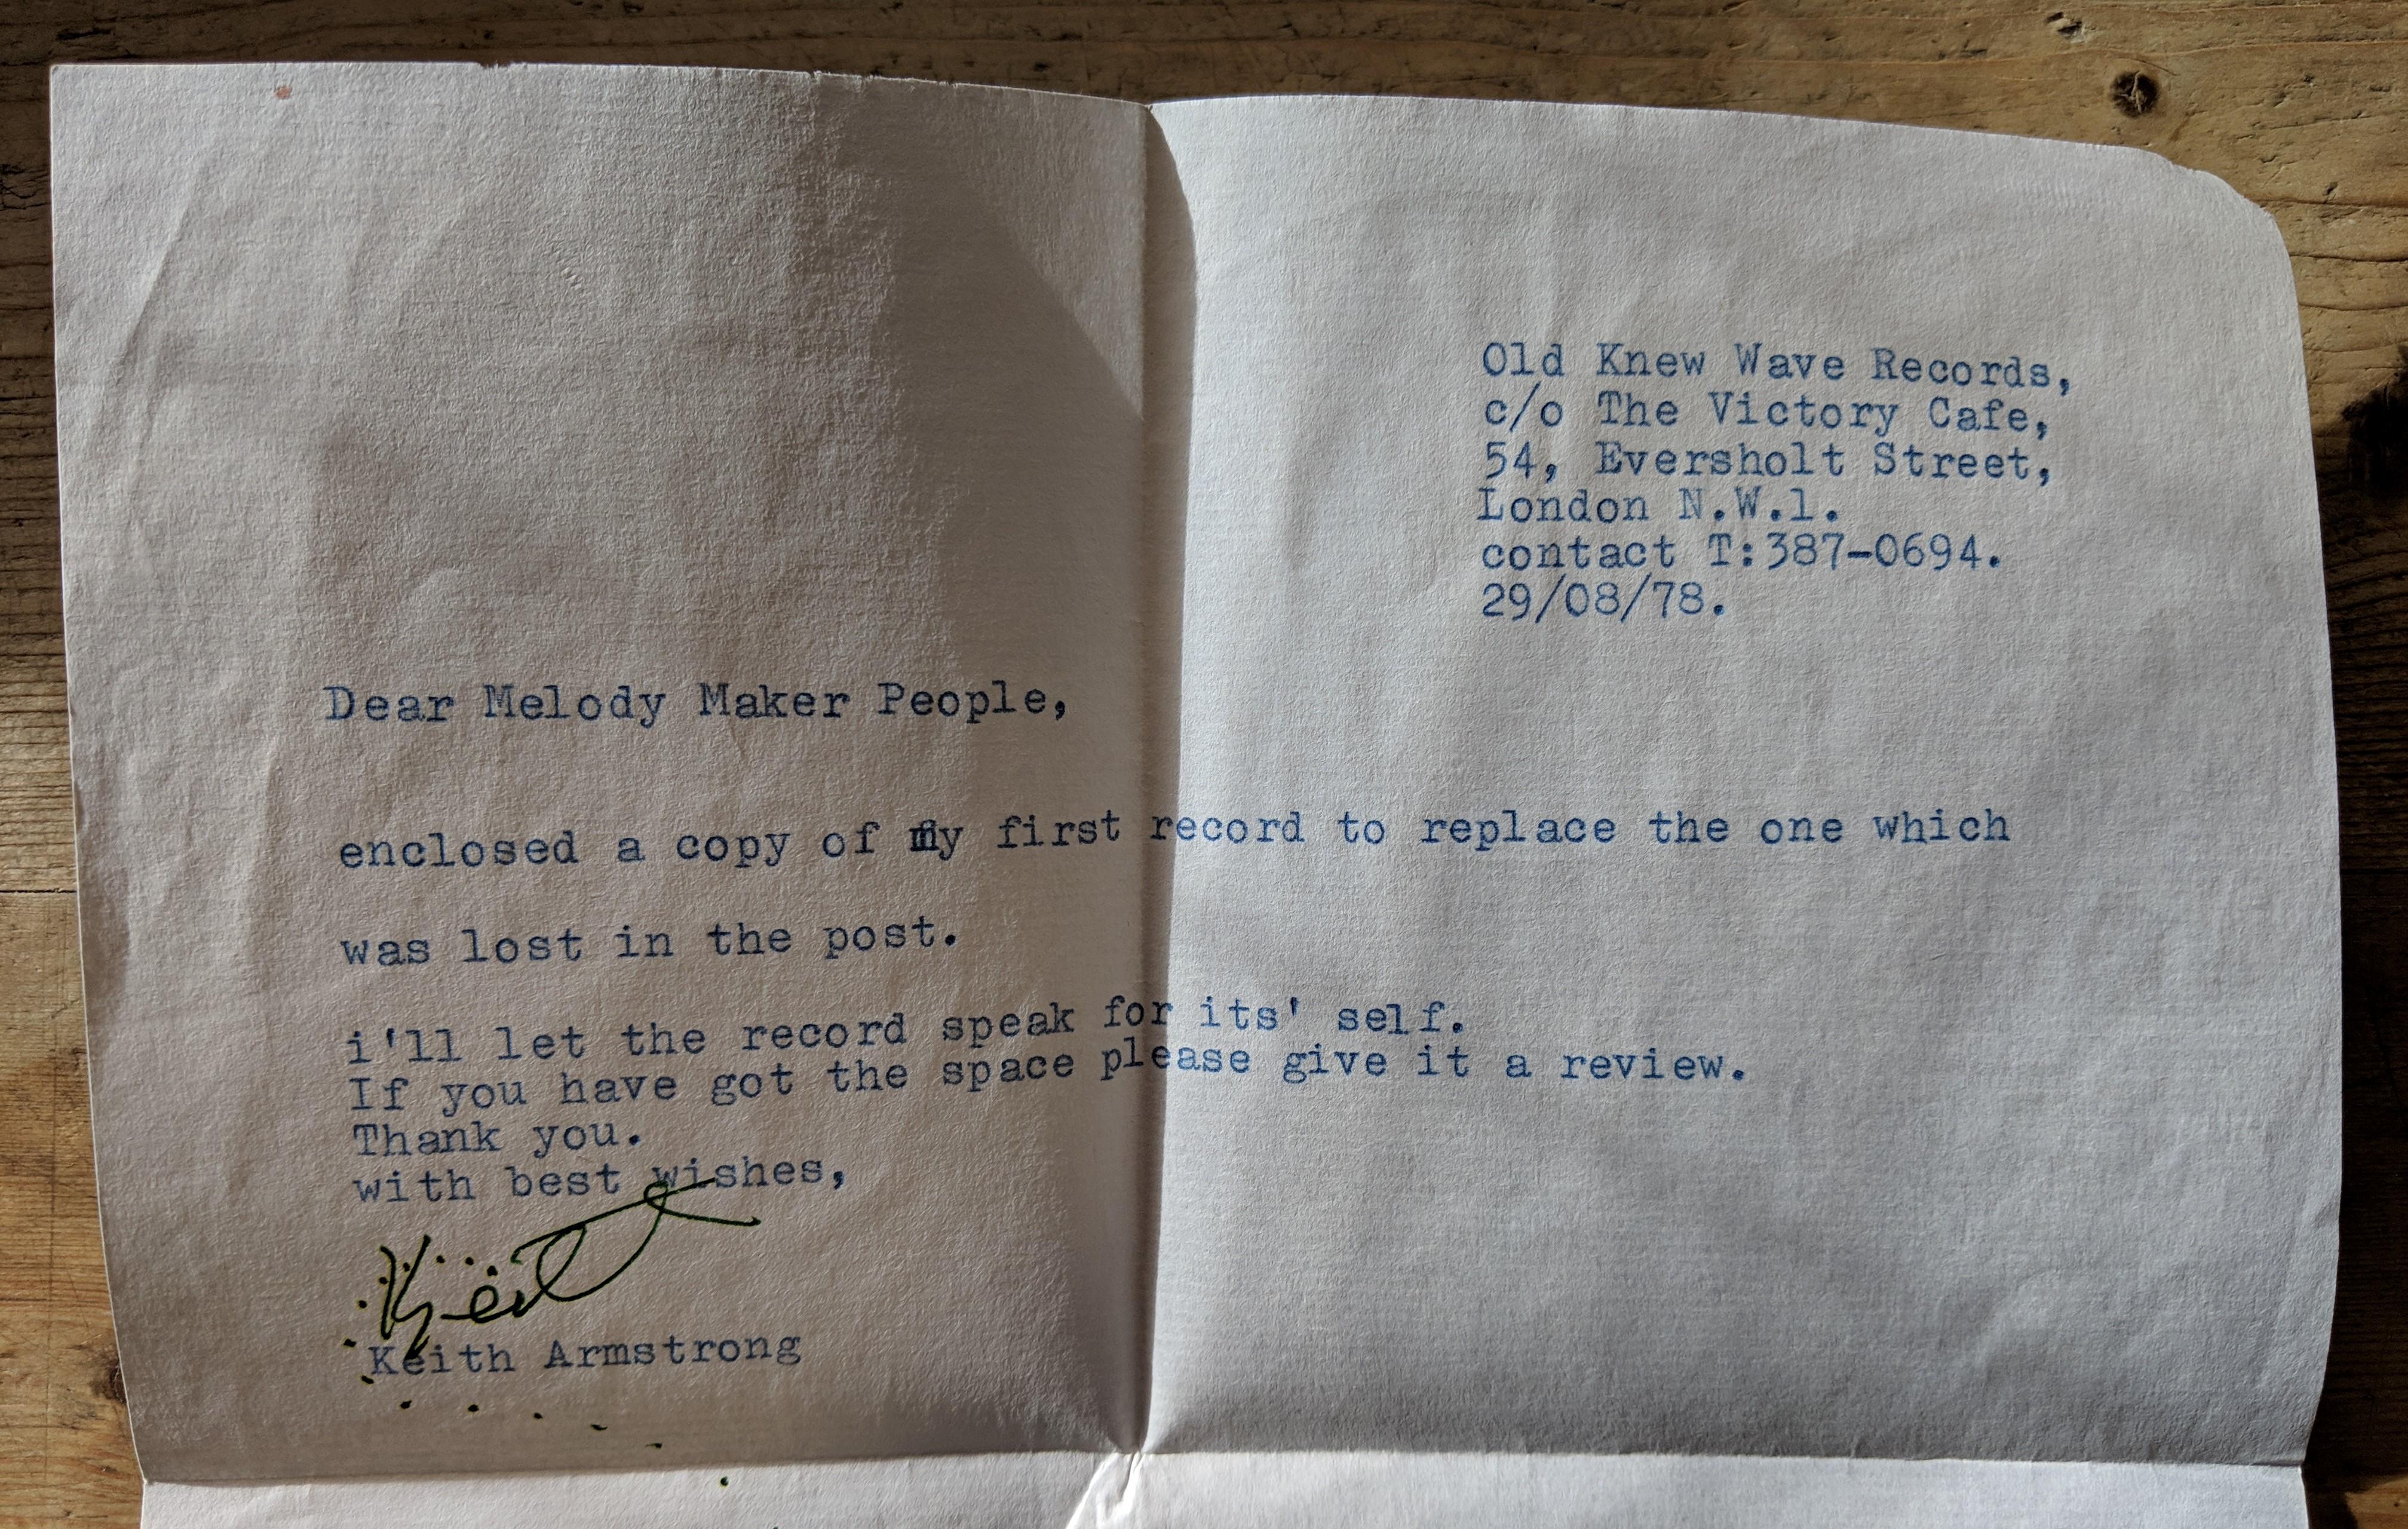 Melody Maker Letter